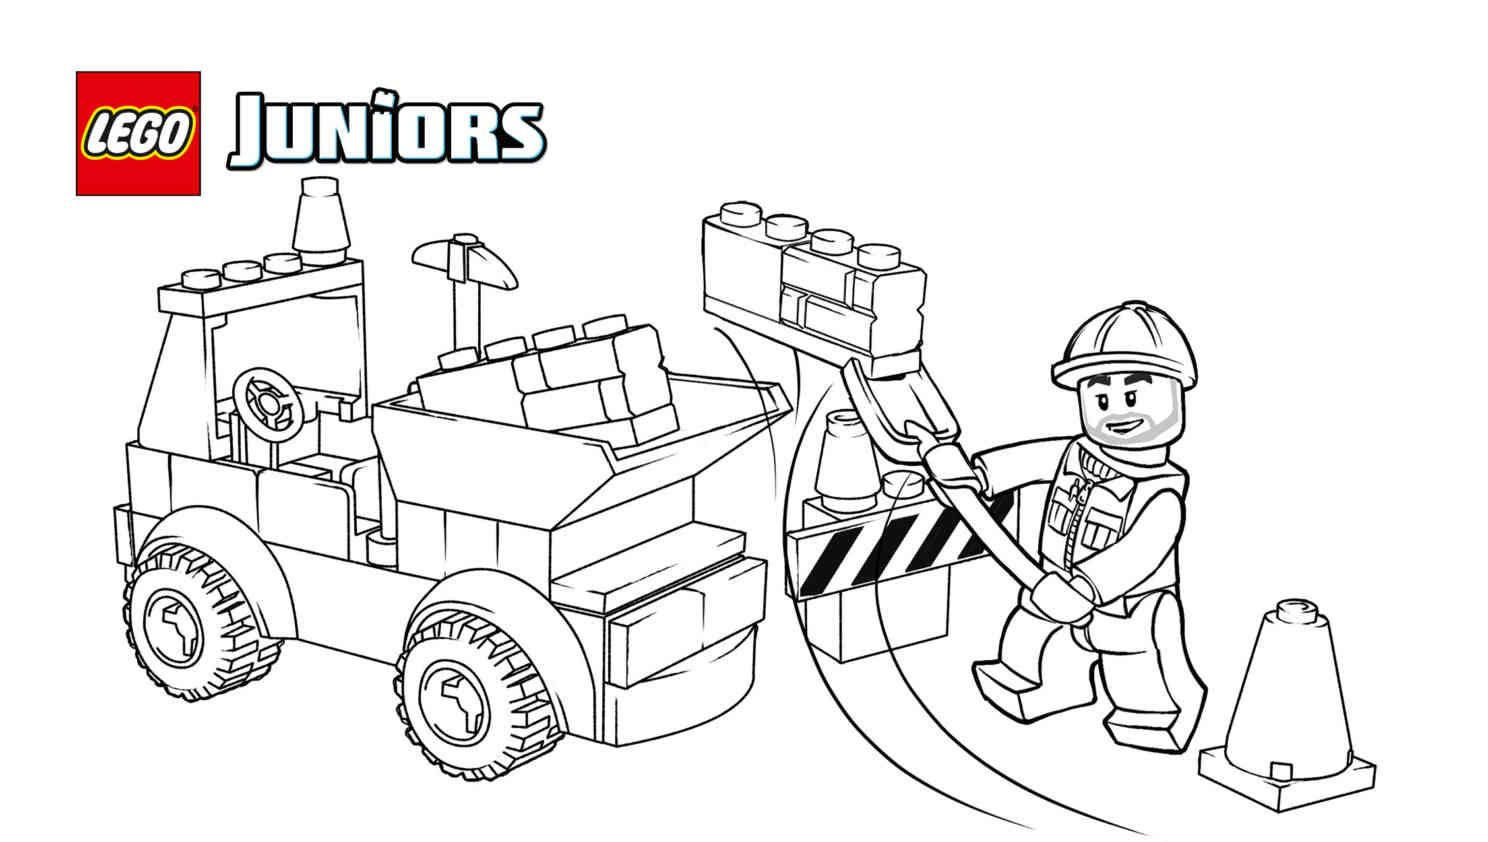 lego 10667 juniors construction 3 coloring sheet lego coloring sheets lego juniors. Black Bedroom Furniture Sets. Home Design Ideas